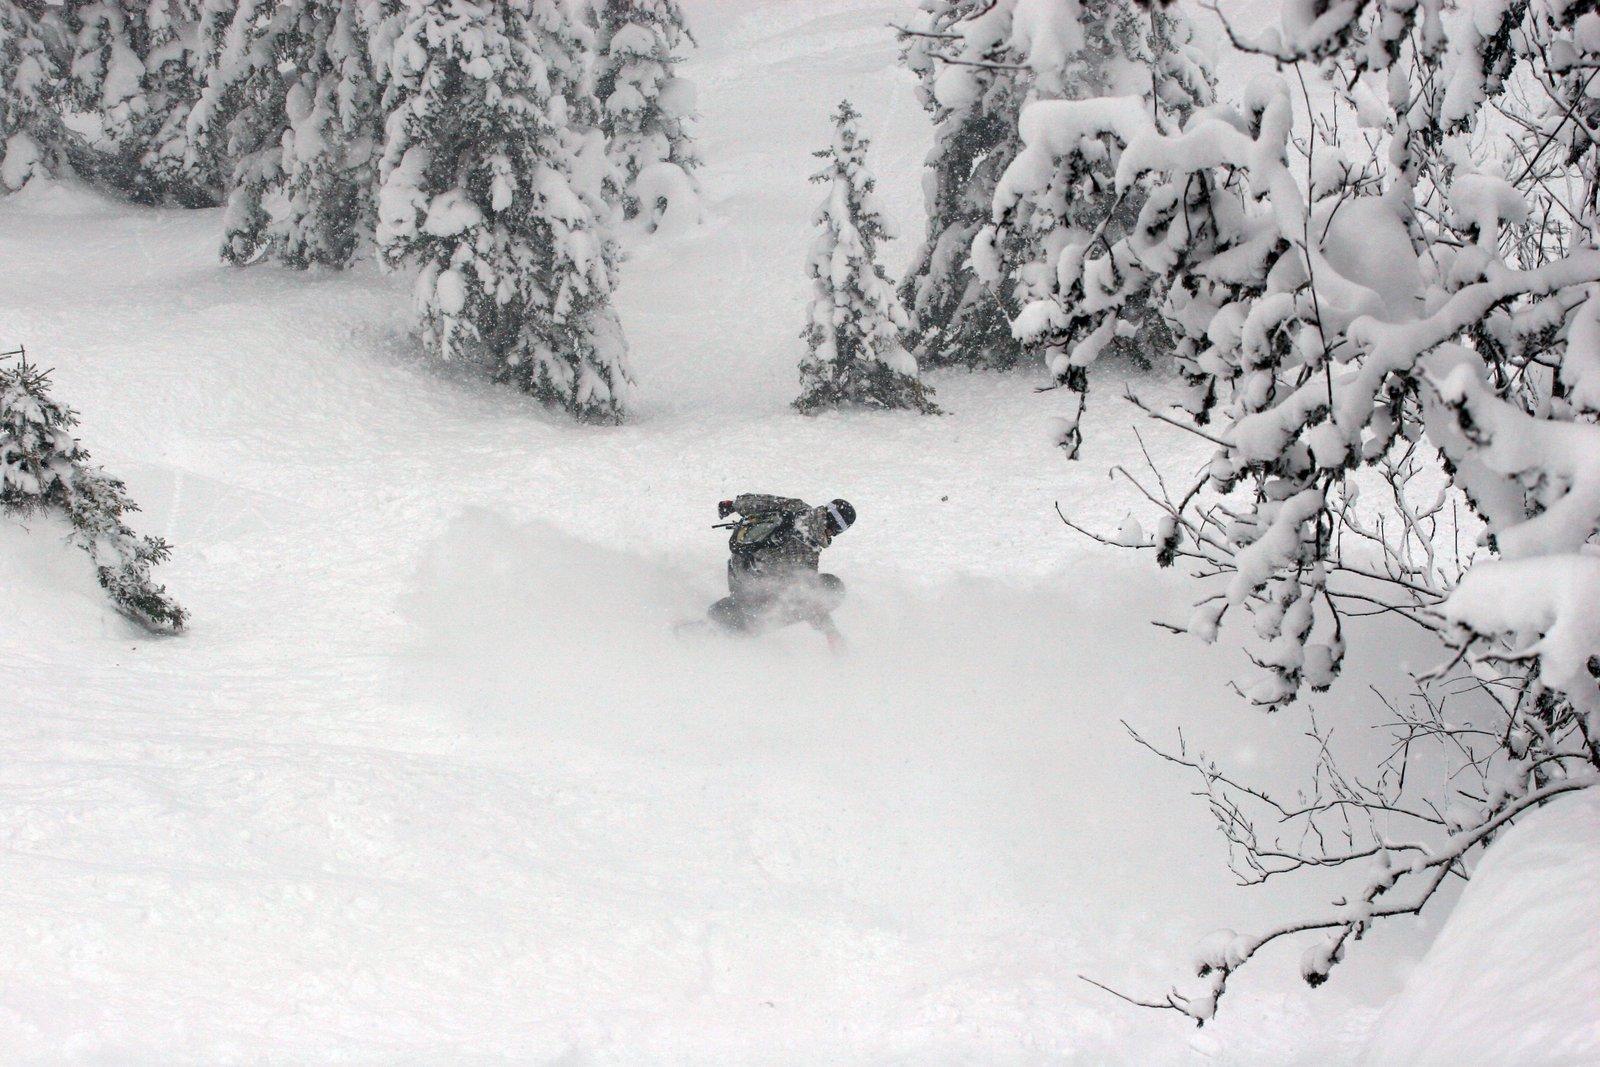 Snowboard turn #2